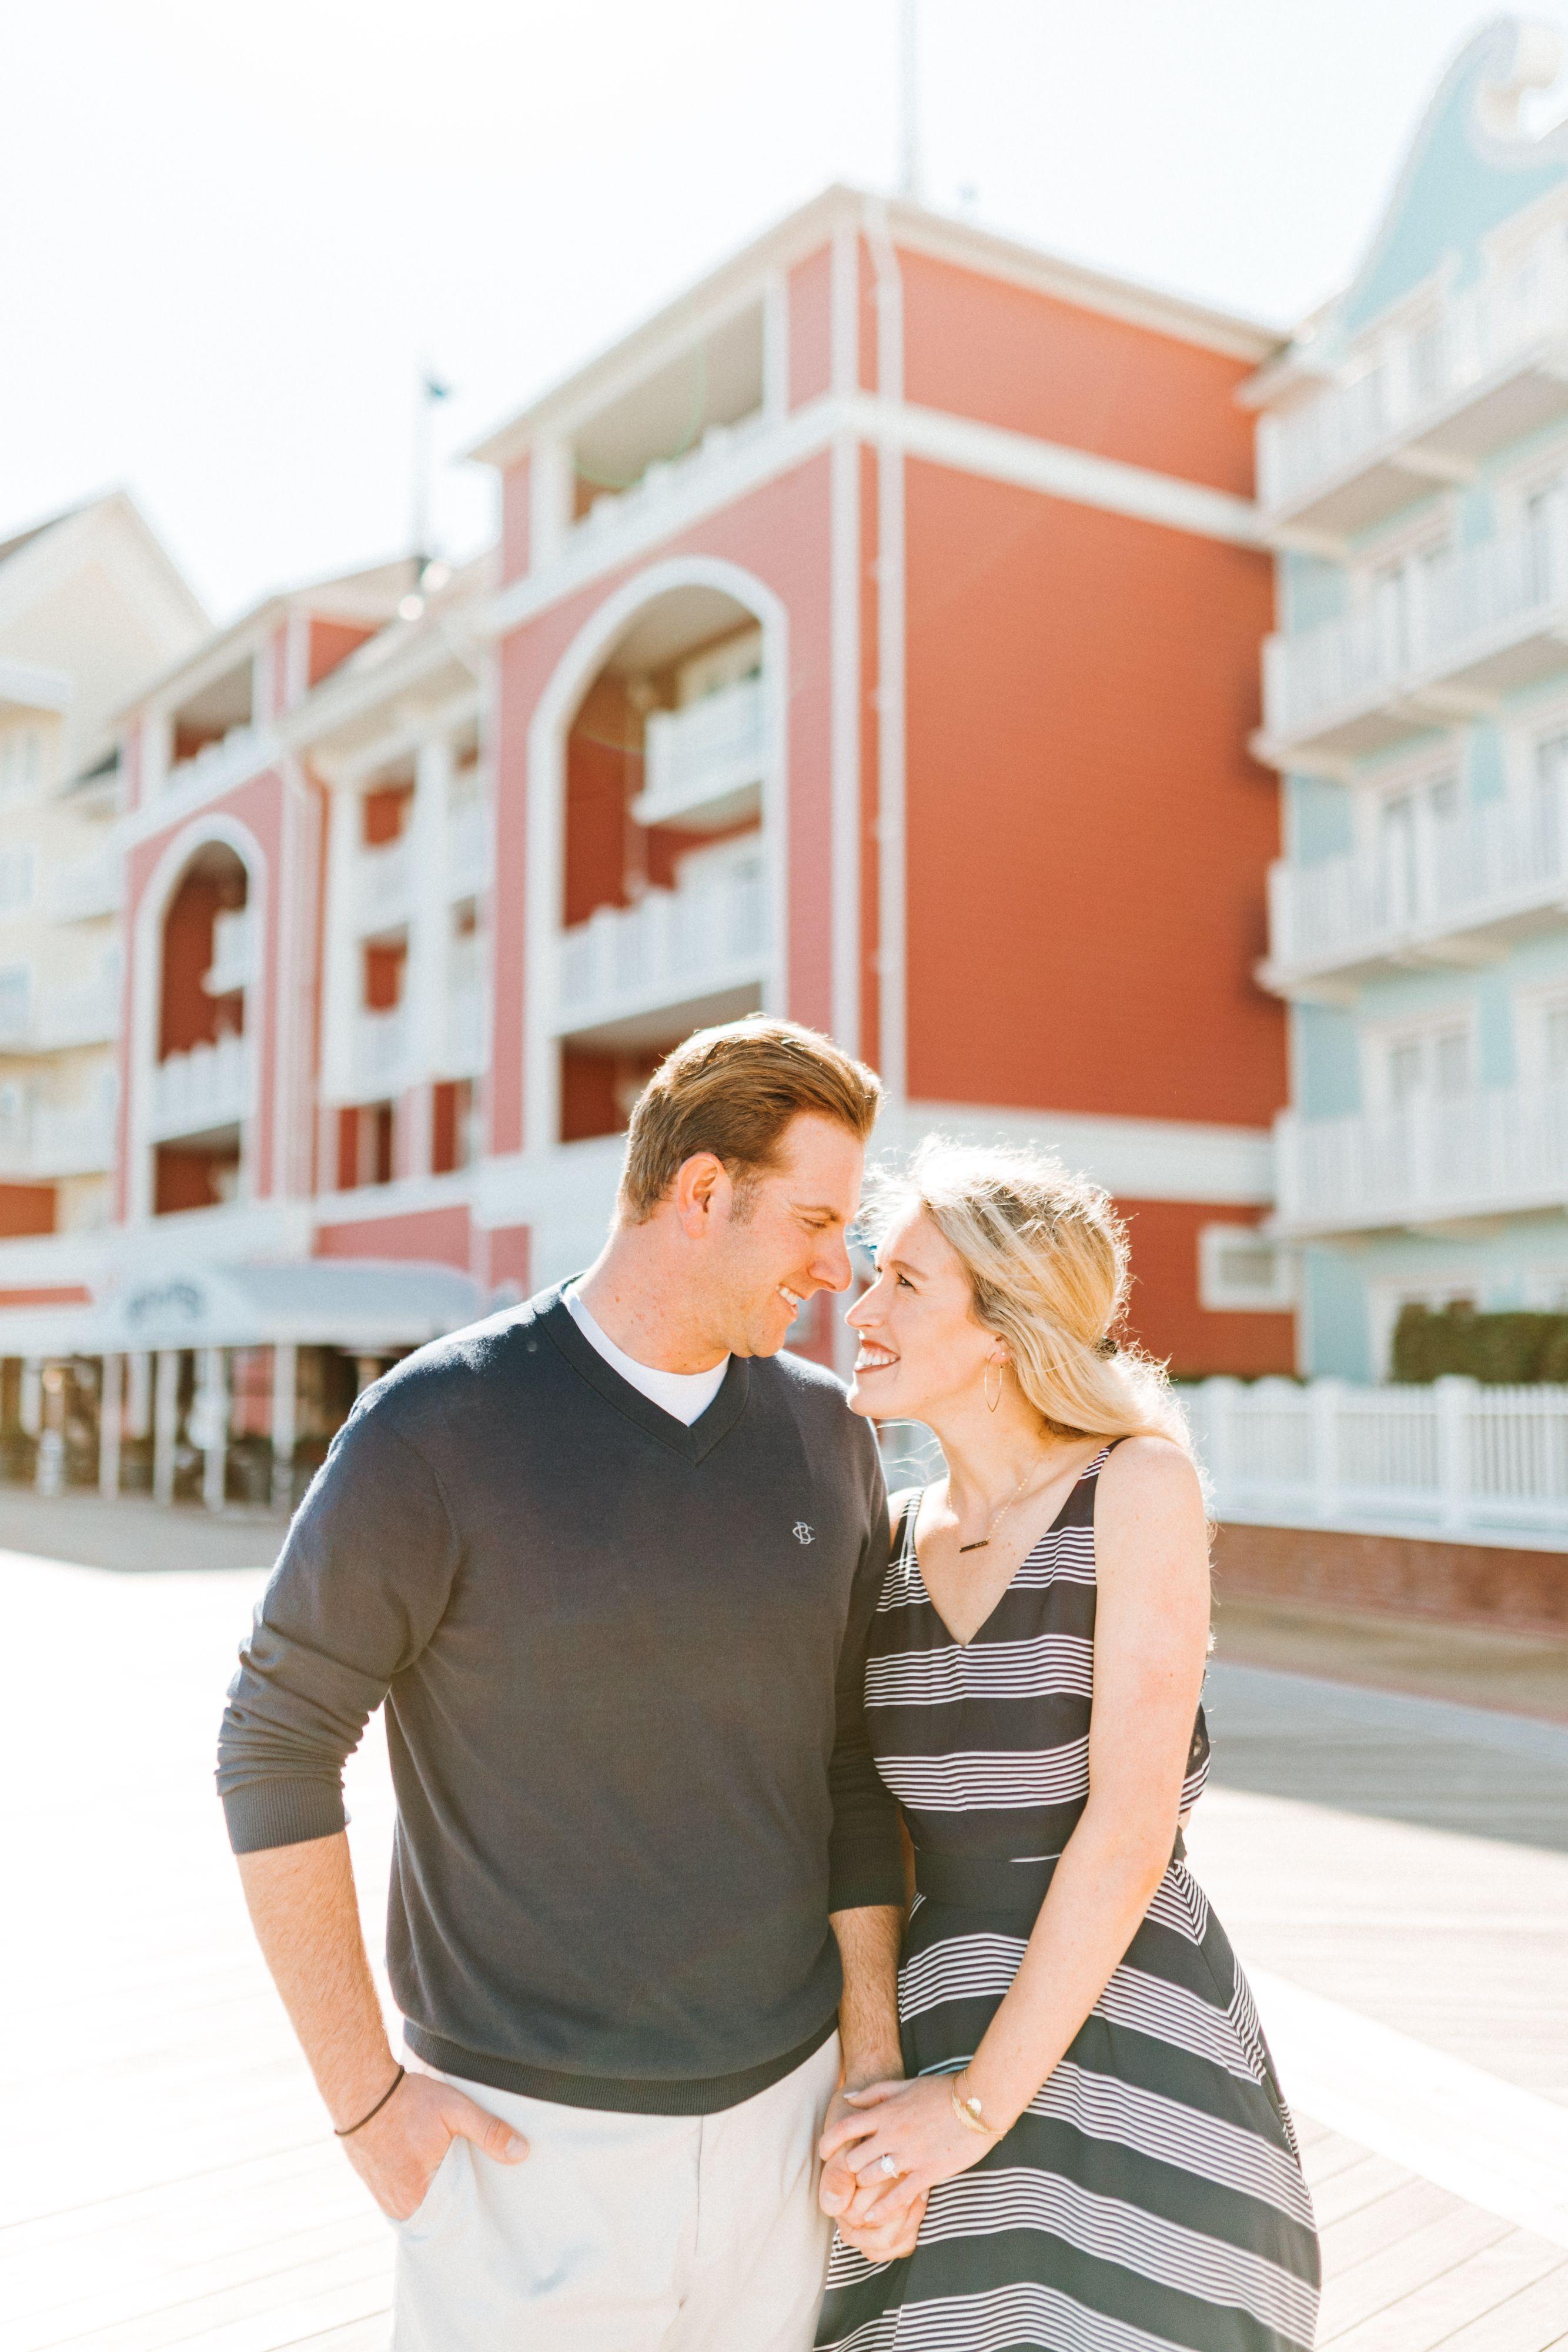 Sunny Morning Engagement on the Boardwalk near Epcot in Walt Disney World